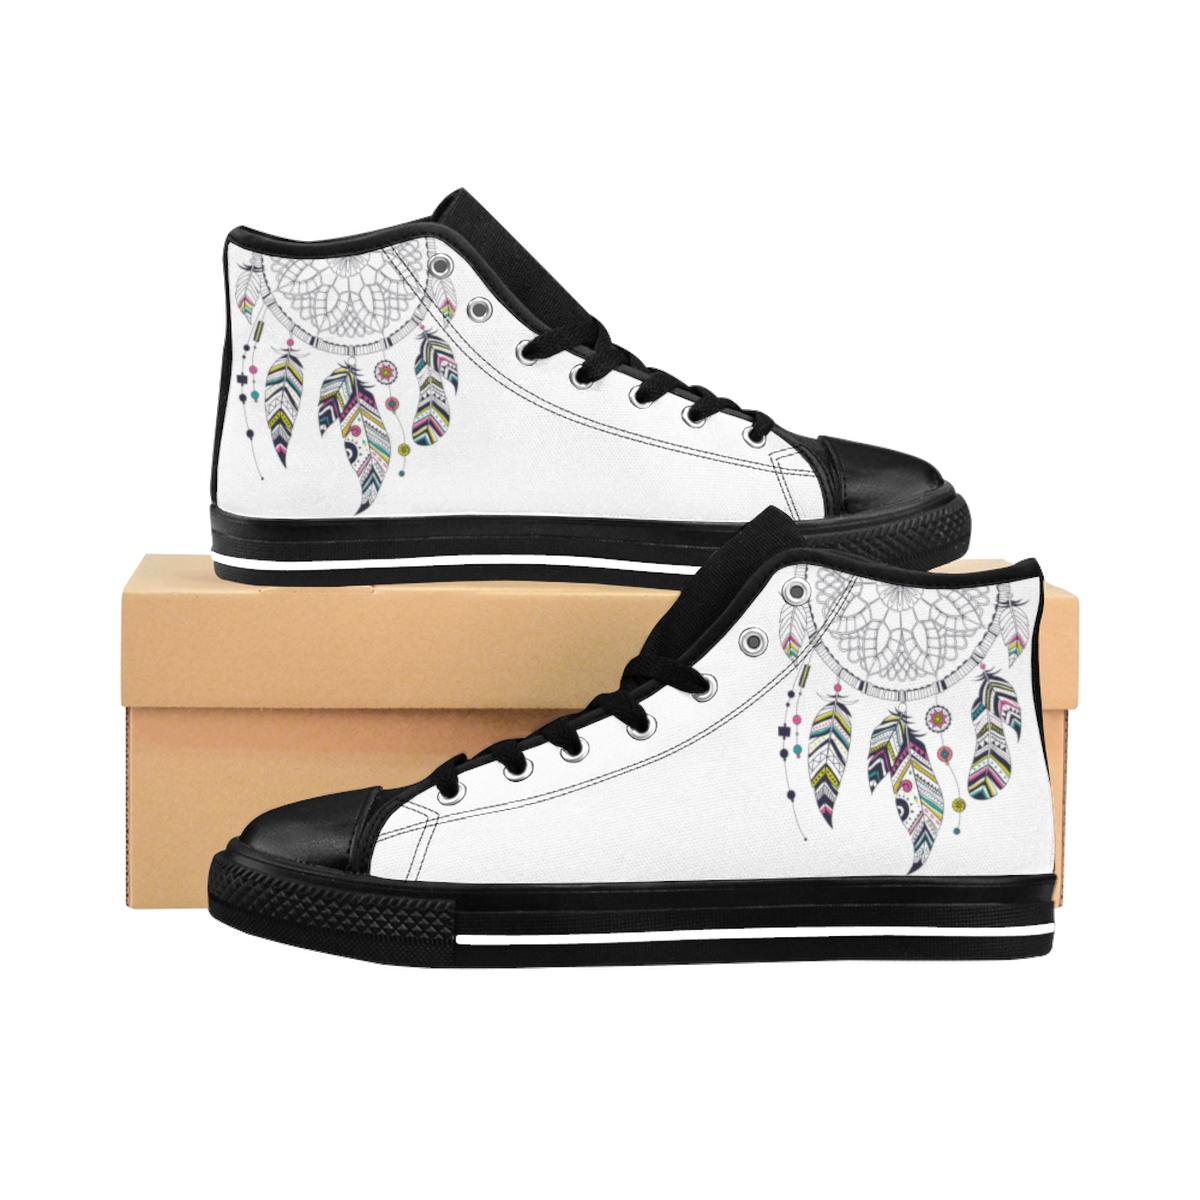 Traumfänger Frauen High-top Sneakers